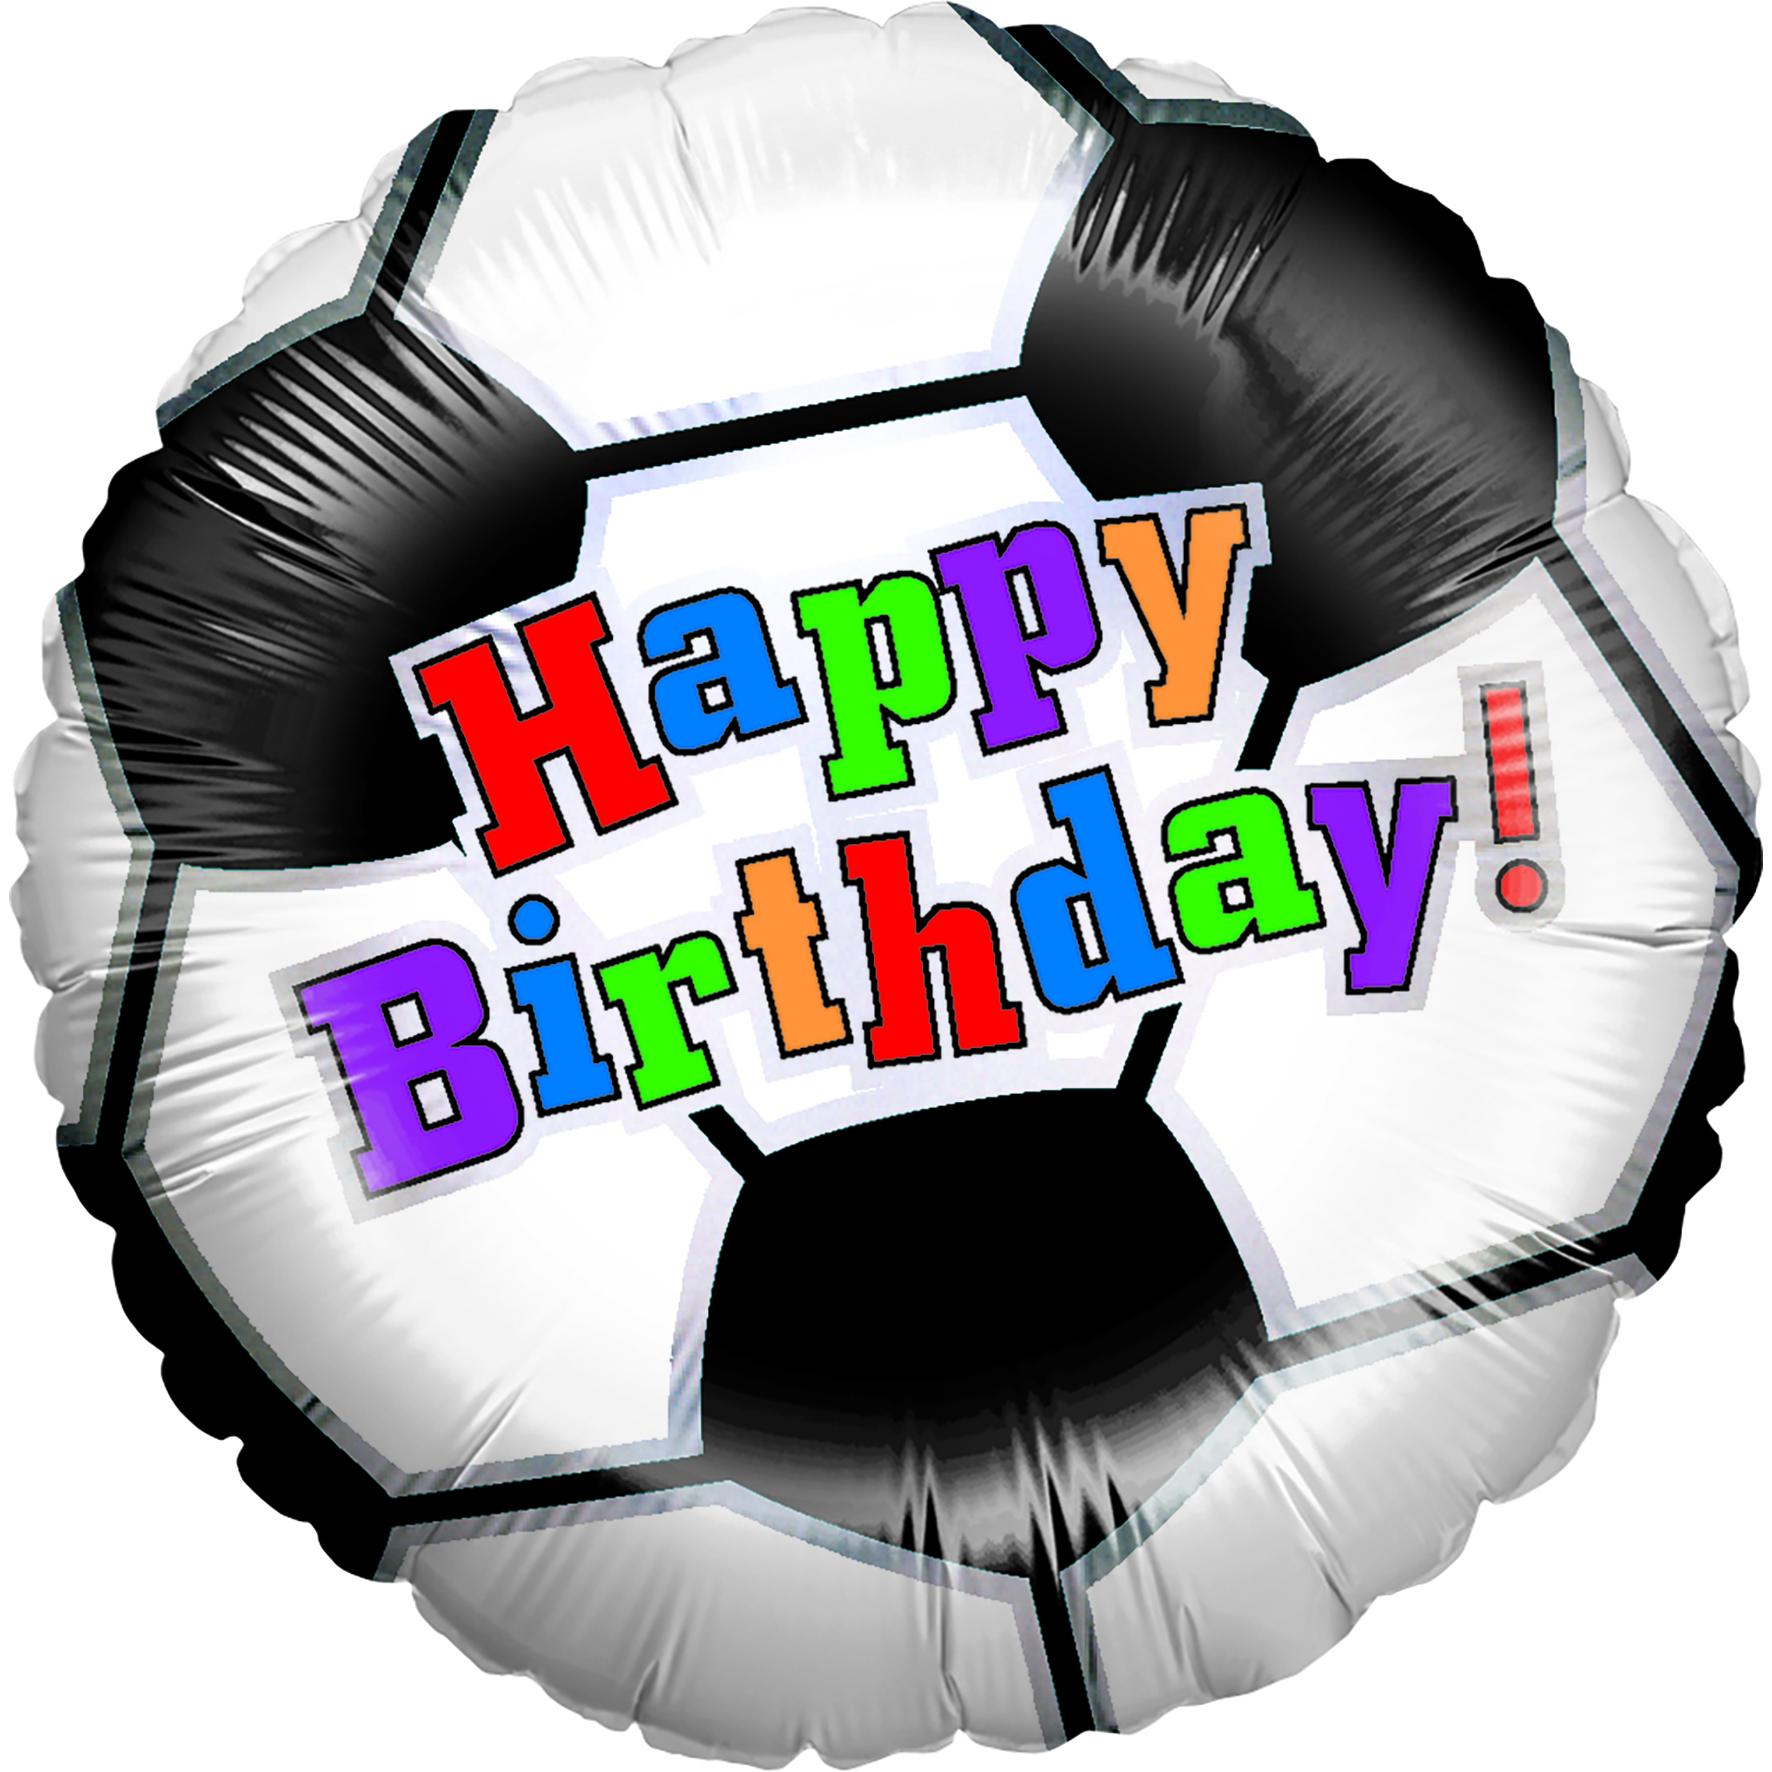 Festivitré Https Fournisseur Ballon Decoration.com Wp Content Uploads 2018 10 86280 R18 Soccer Ball Birthday